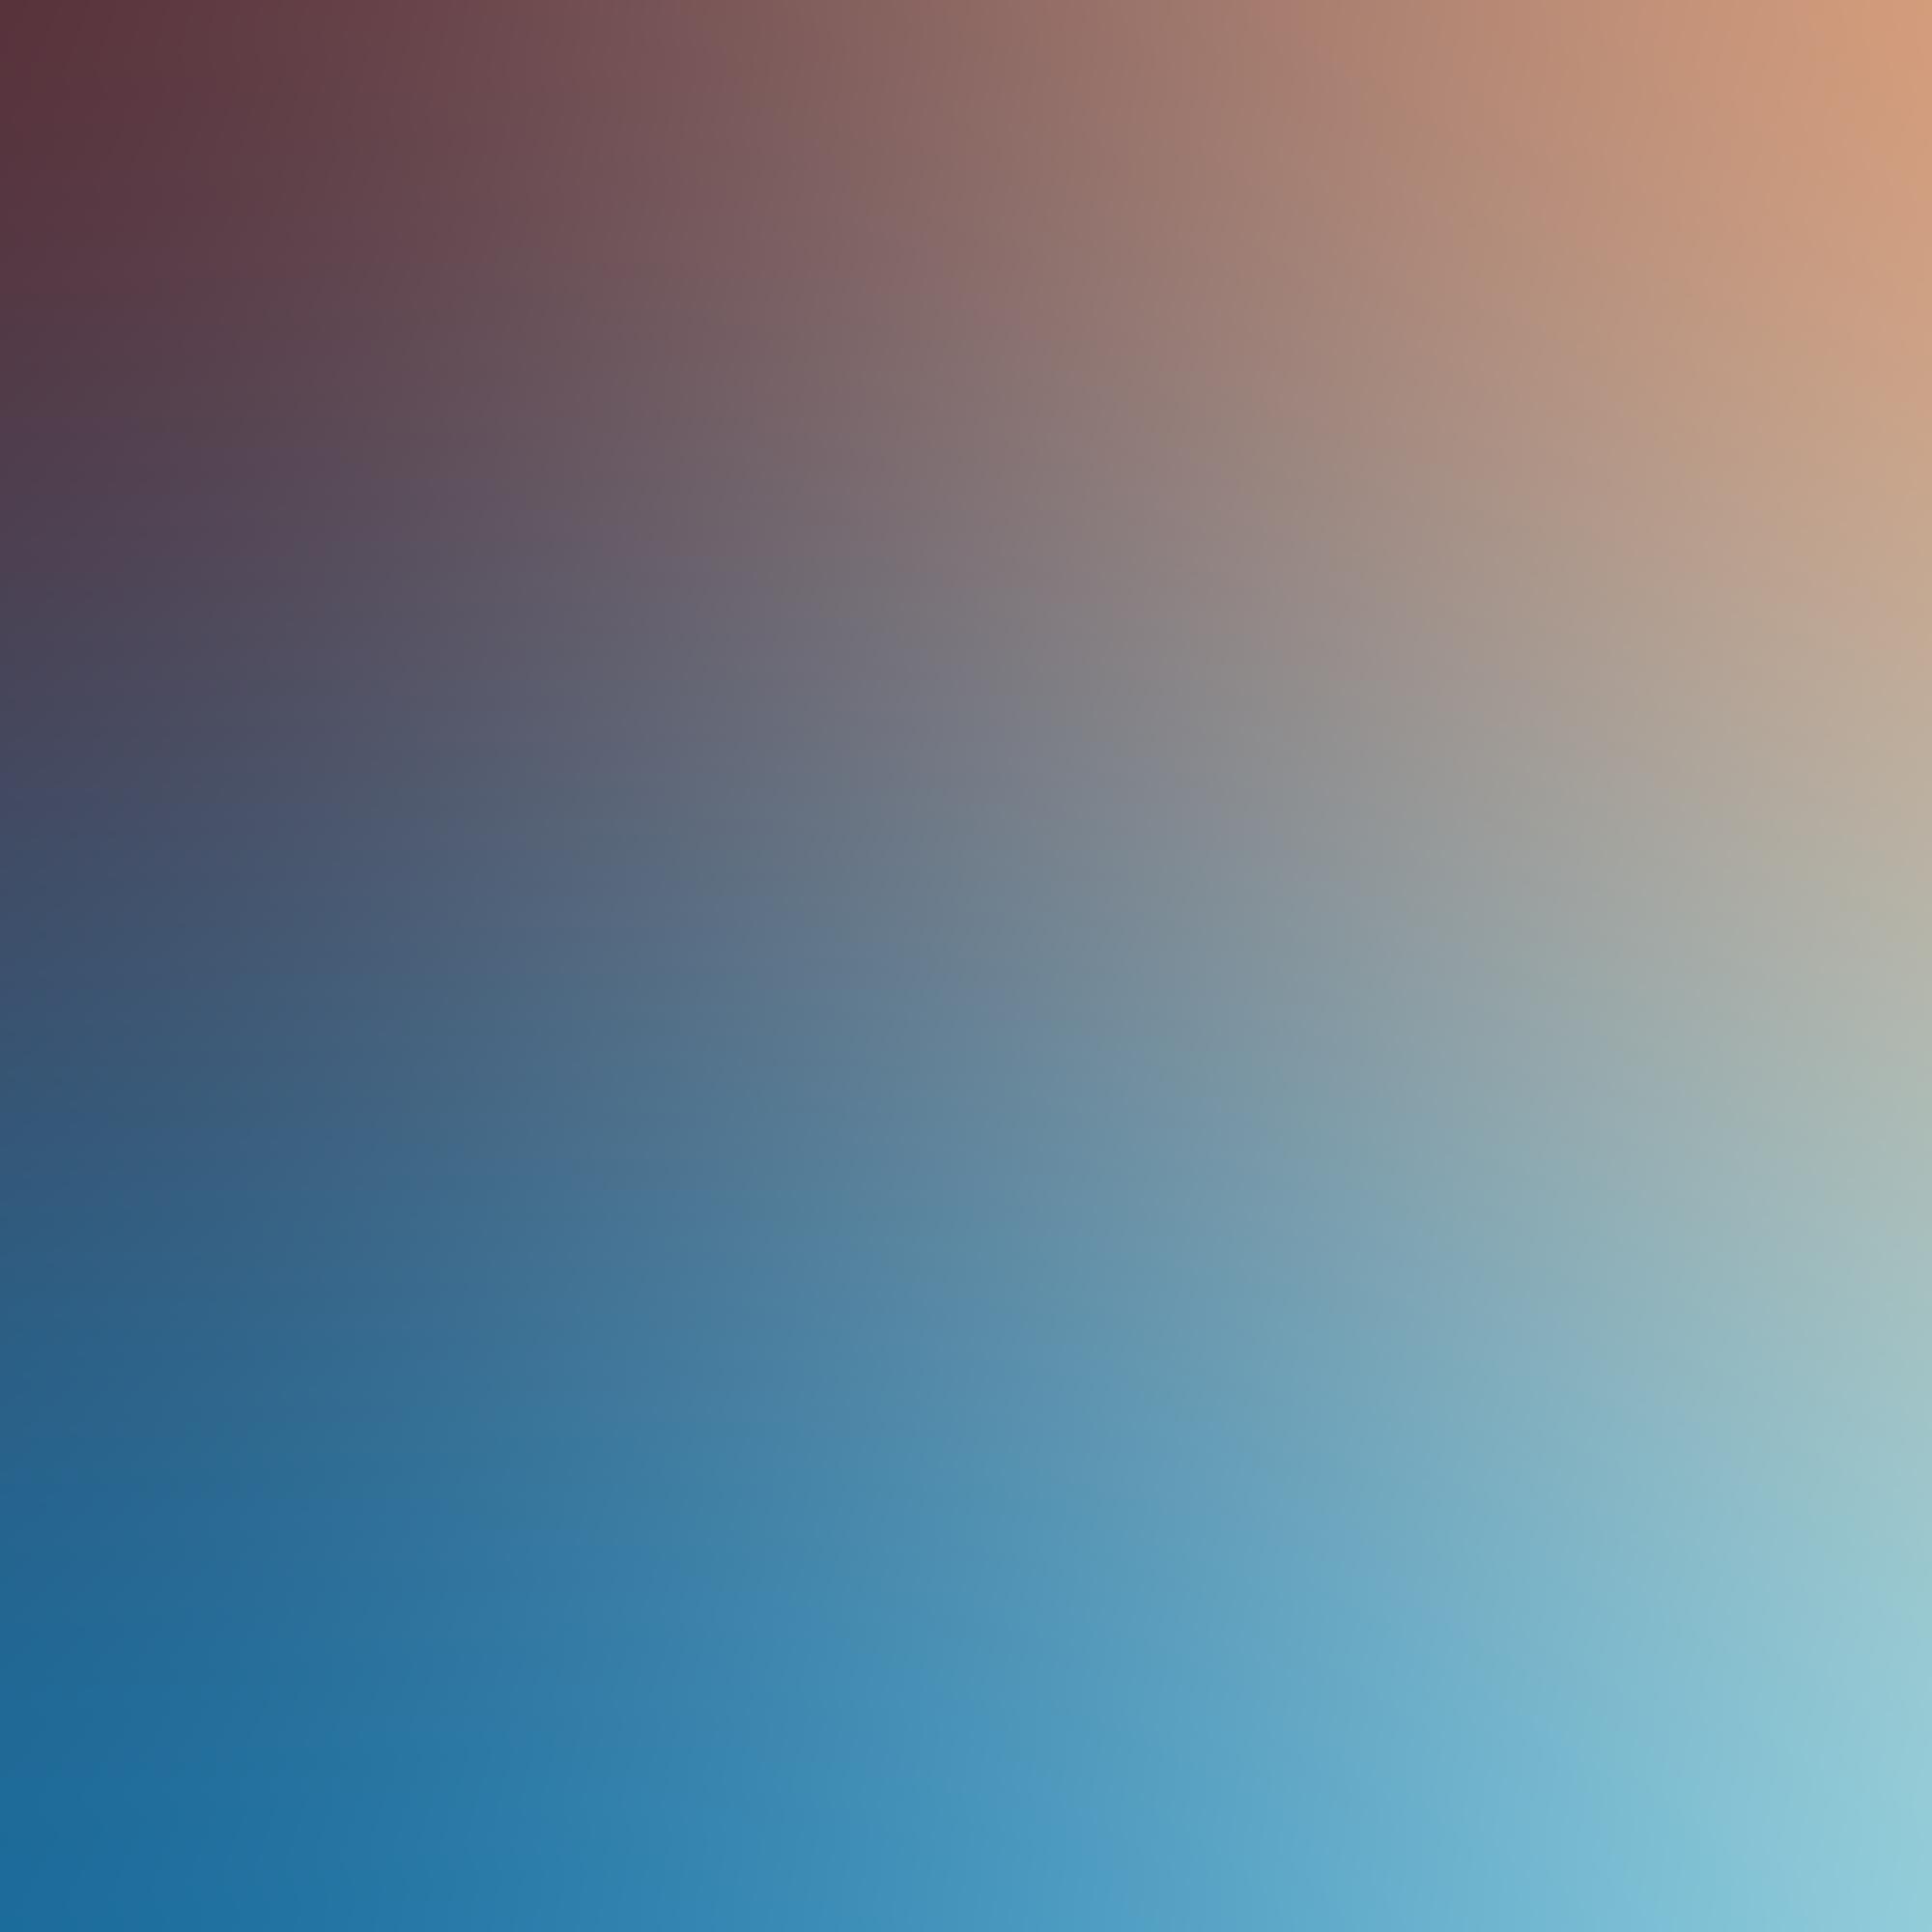 gradients_3.png